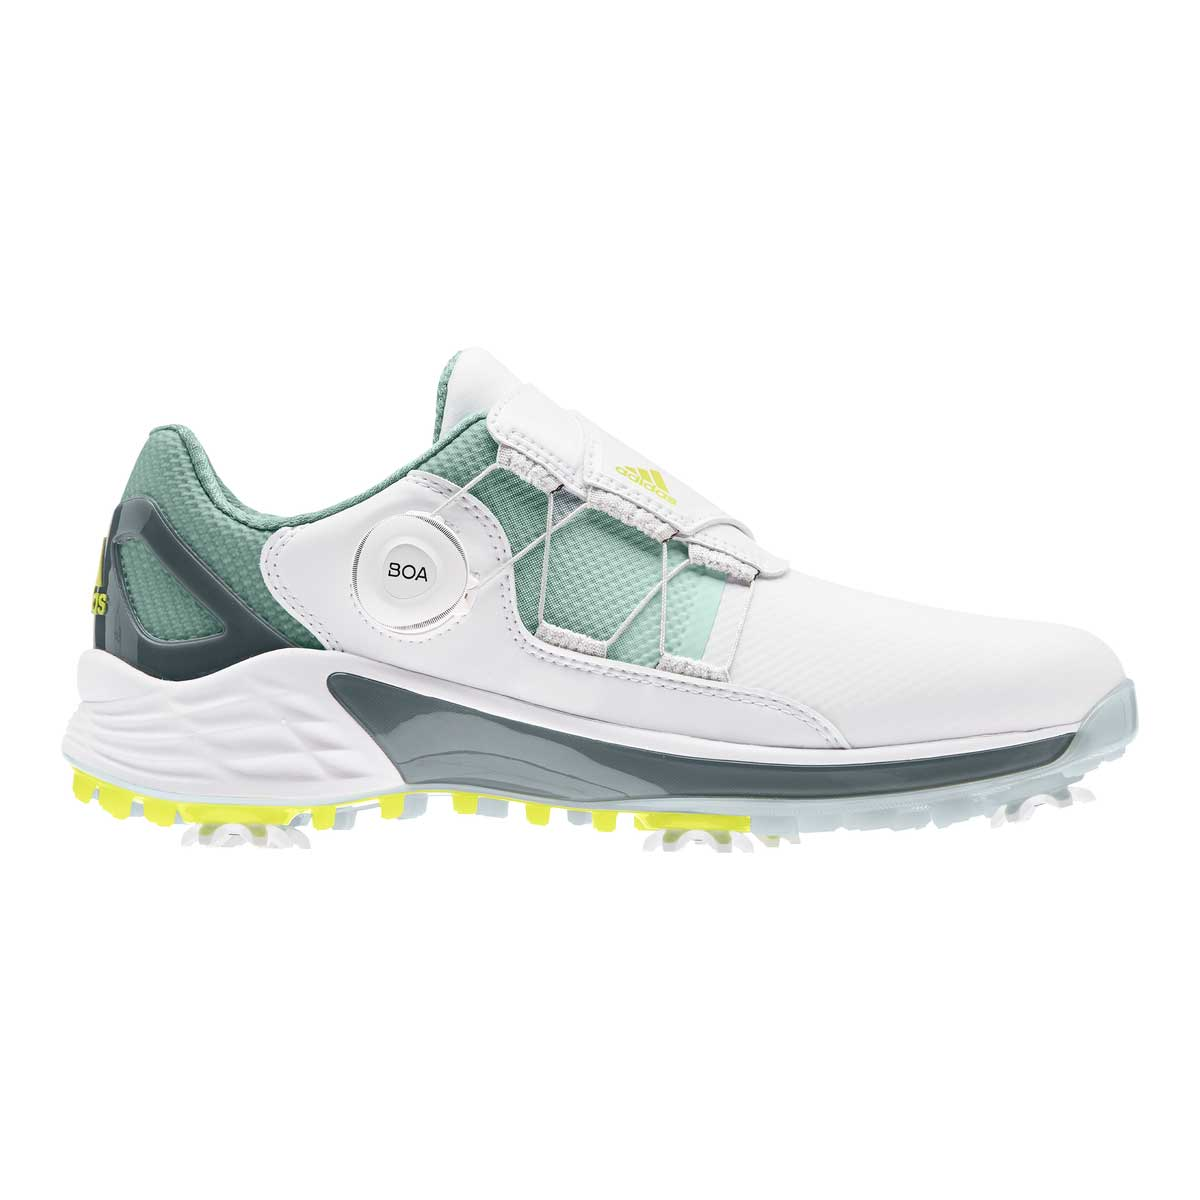 Adidas Women's ZG21 BOA White/Acid Yellow Golf Shoe